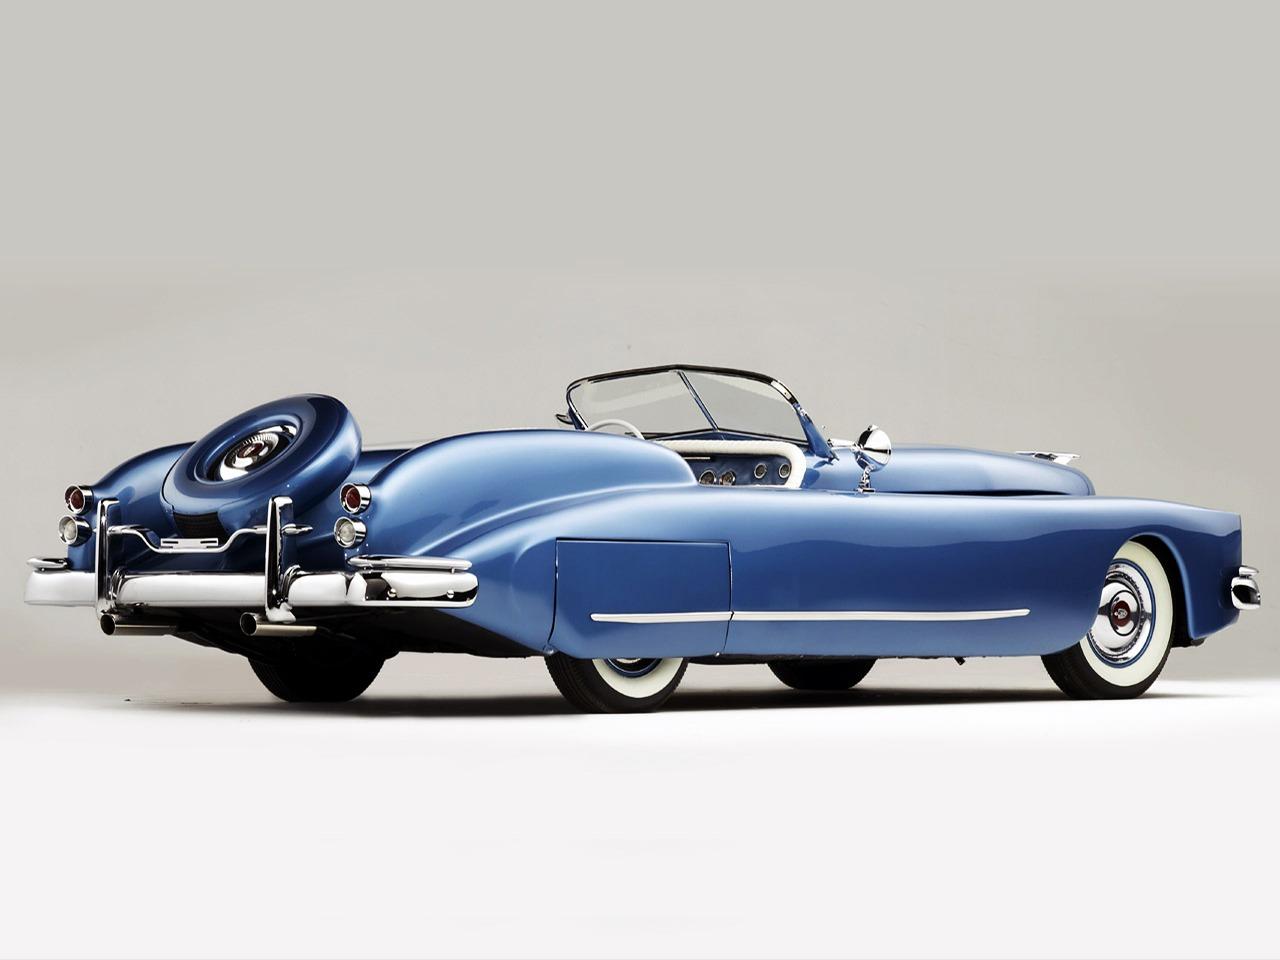 mercury bob hope special concept car (1950) – old concept cars